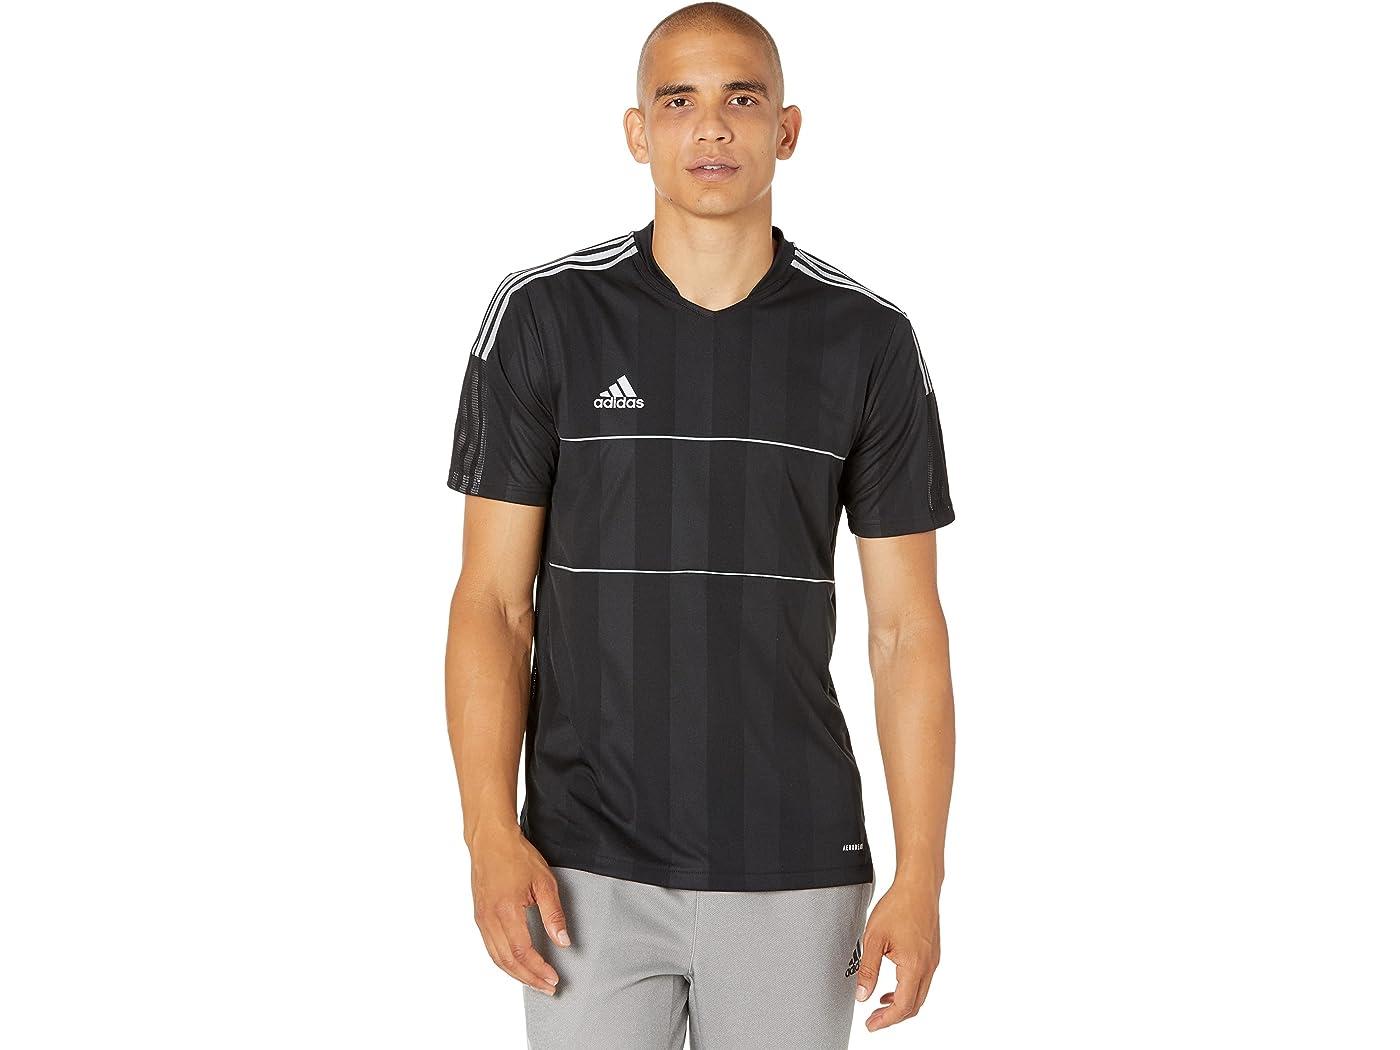 Adidas Tiro 21 Training Jersey